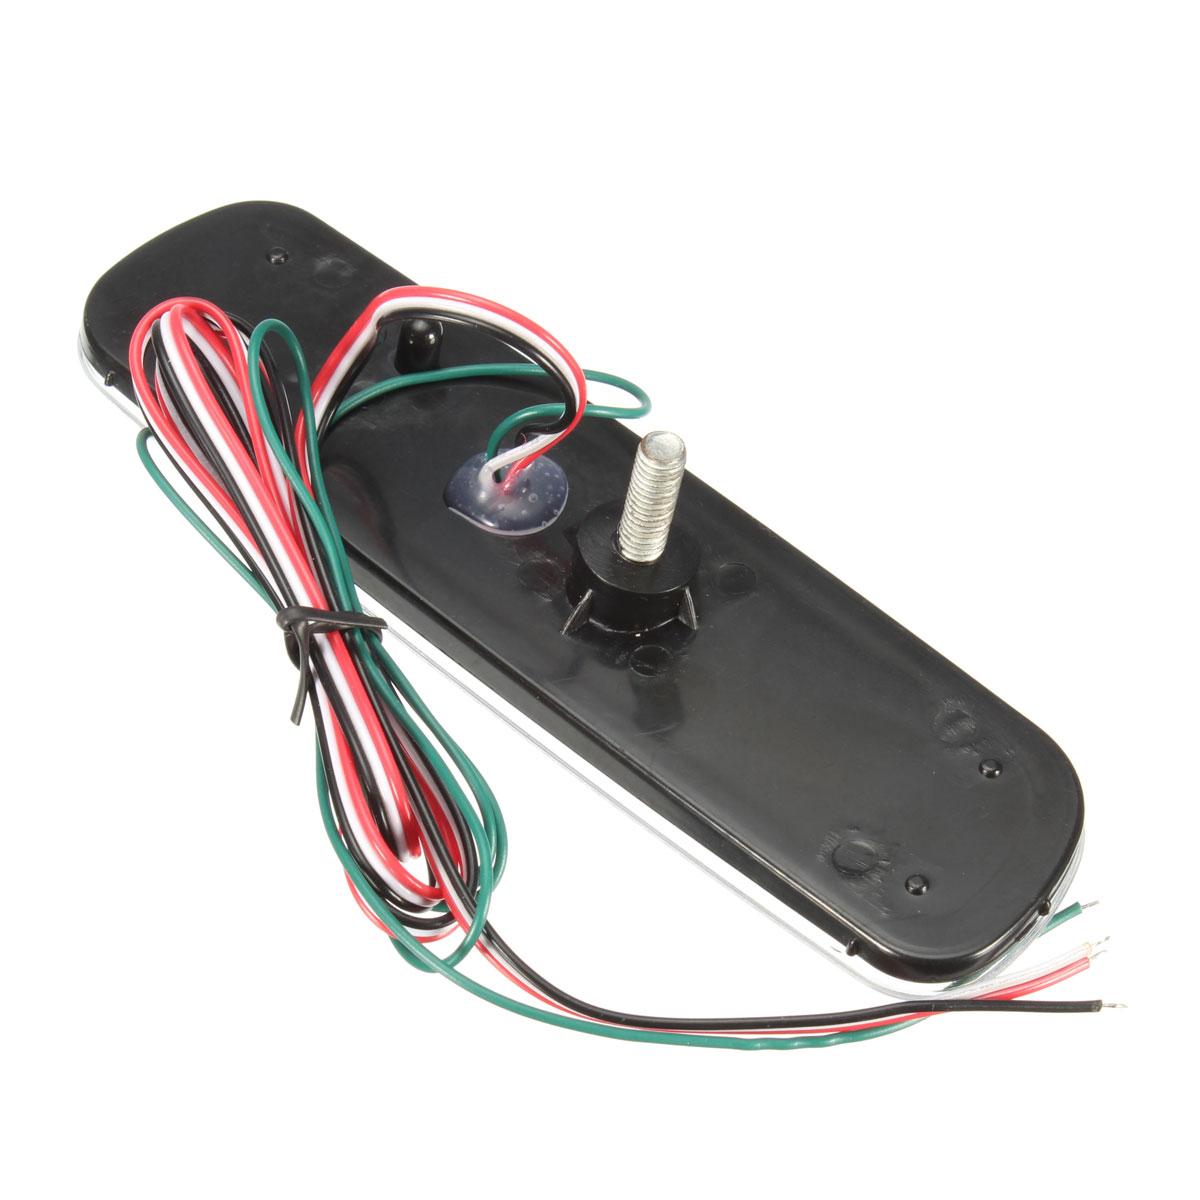 Пара задний бампер отражатель LED тормоз хвост свет сигнала поворота противотуманная фара для LEXUS LX470 - фото 6